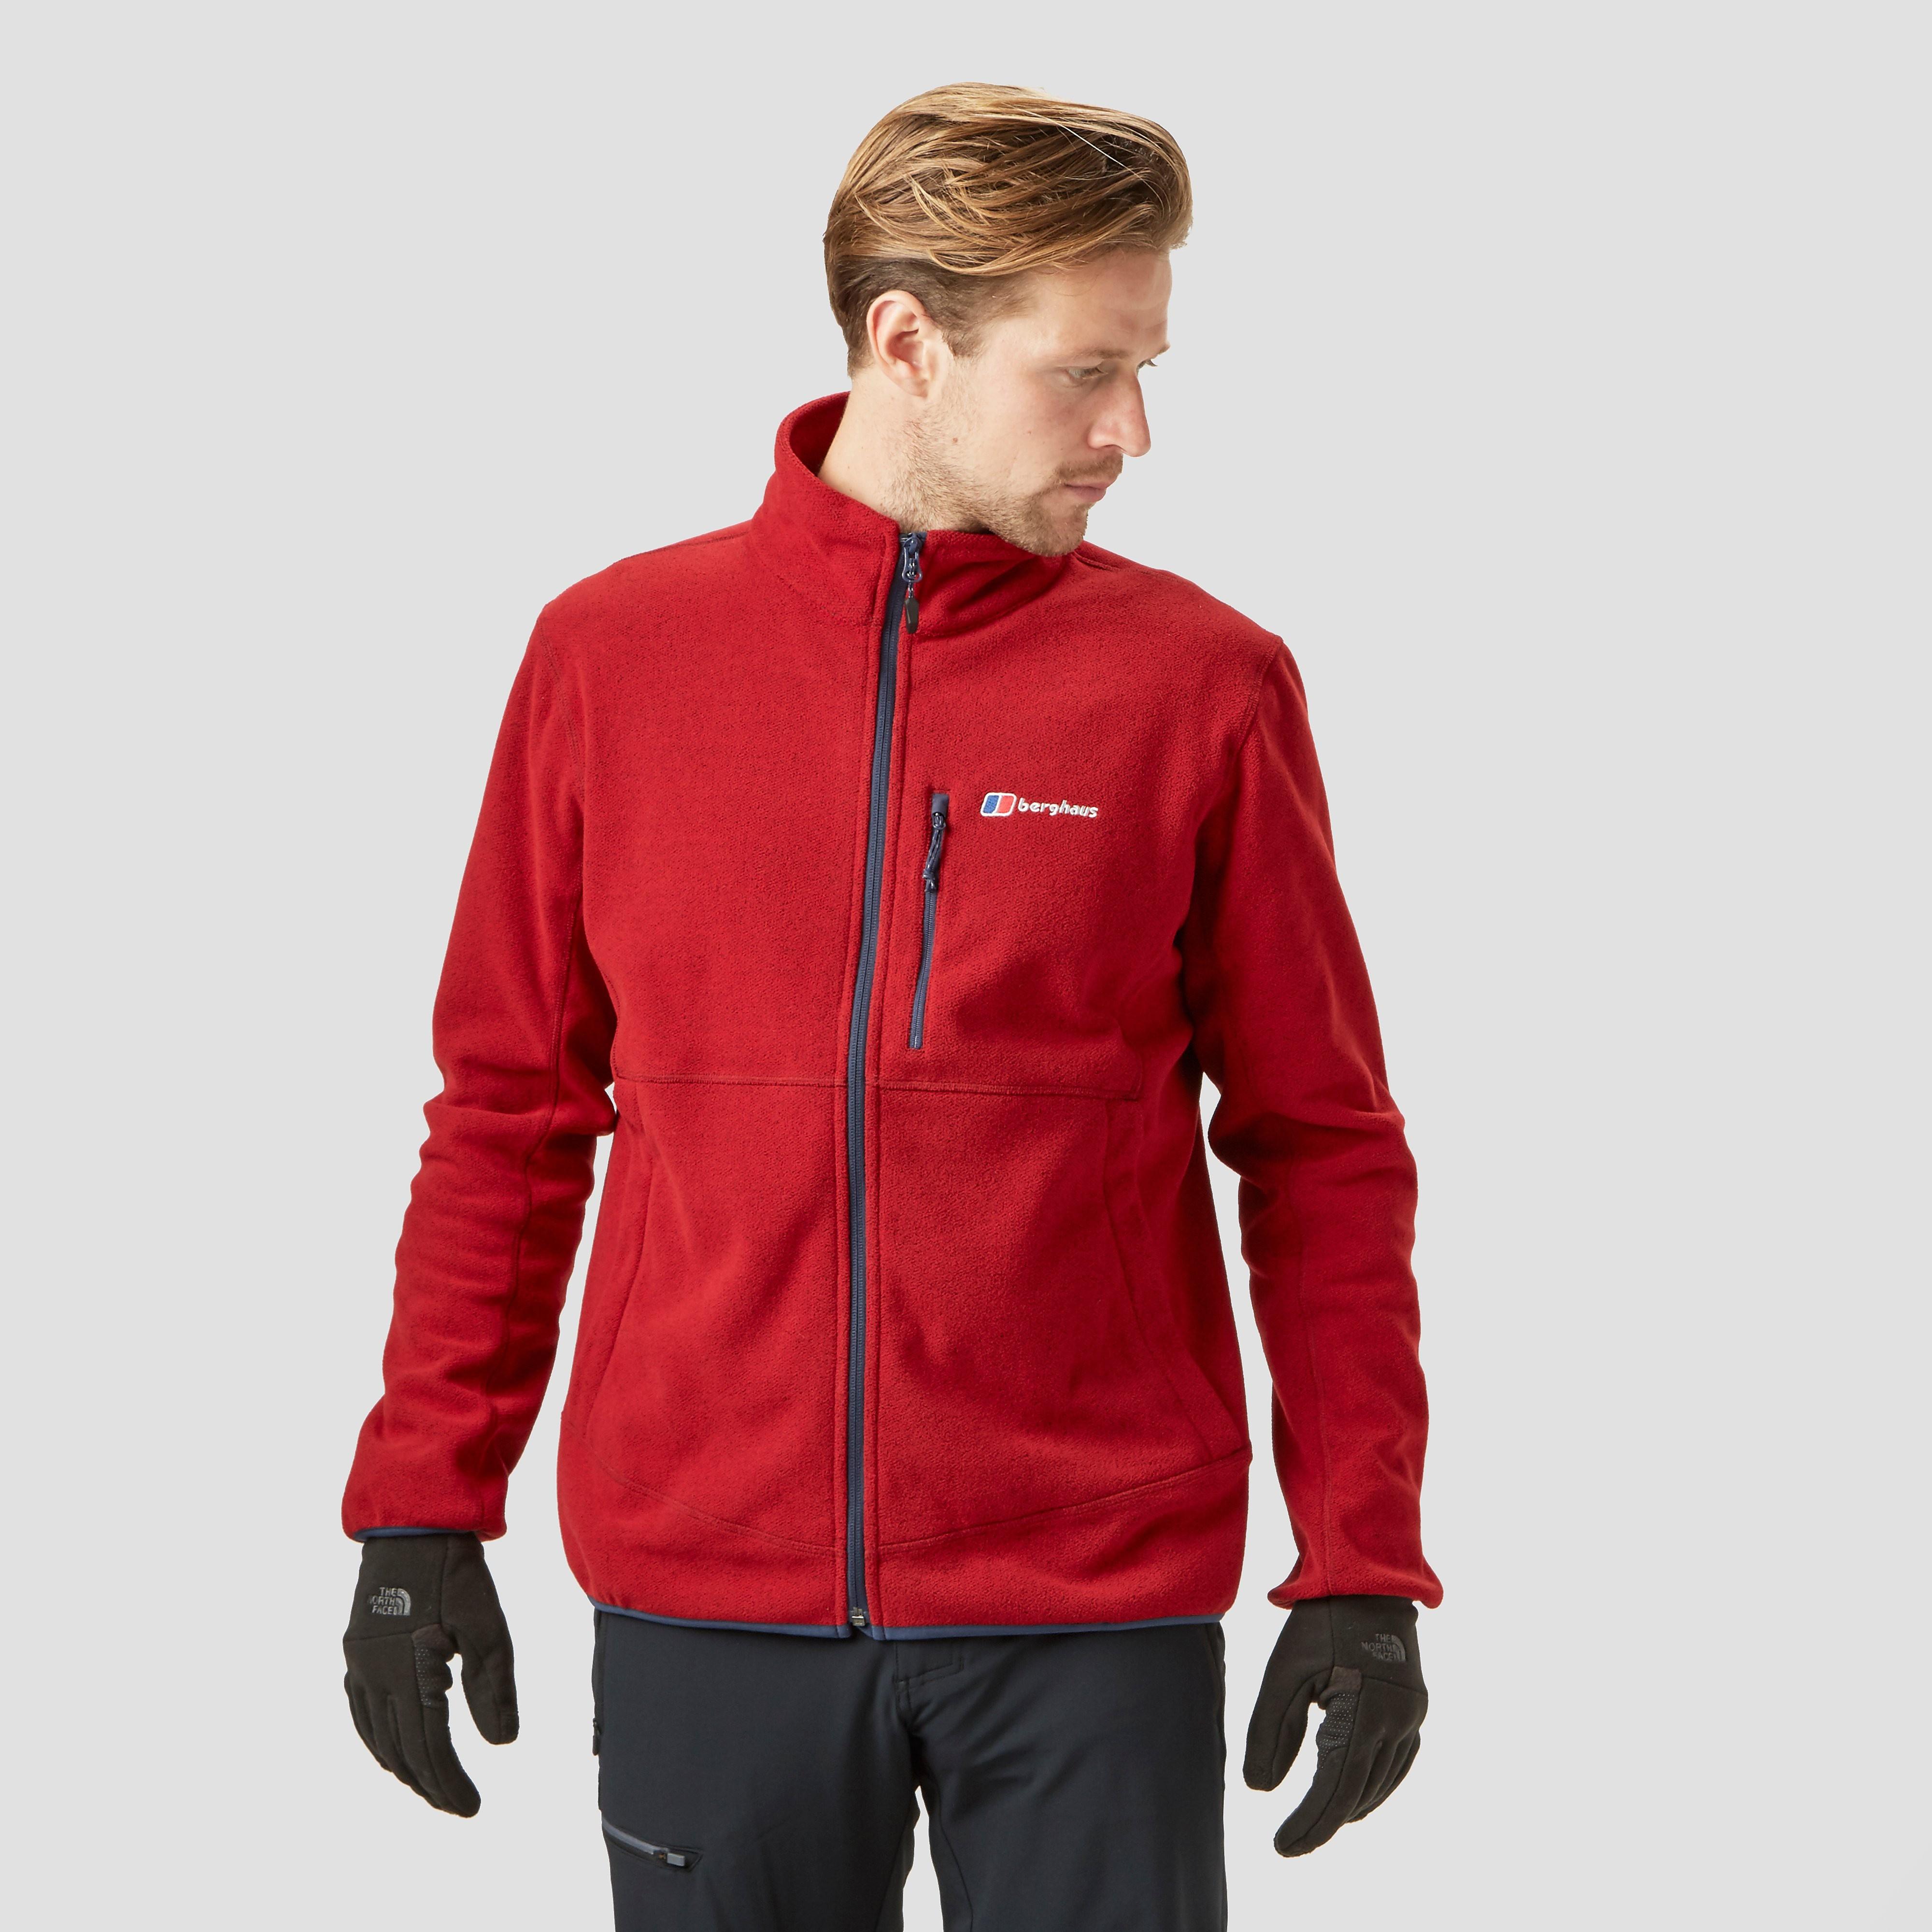 Berghaus Fortrose Fleece Men's Jacket